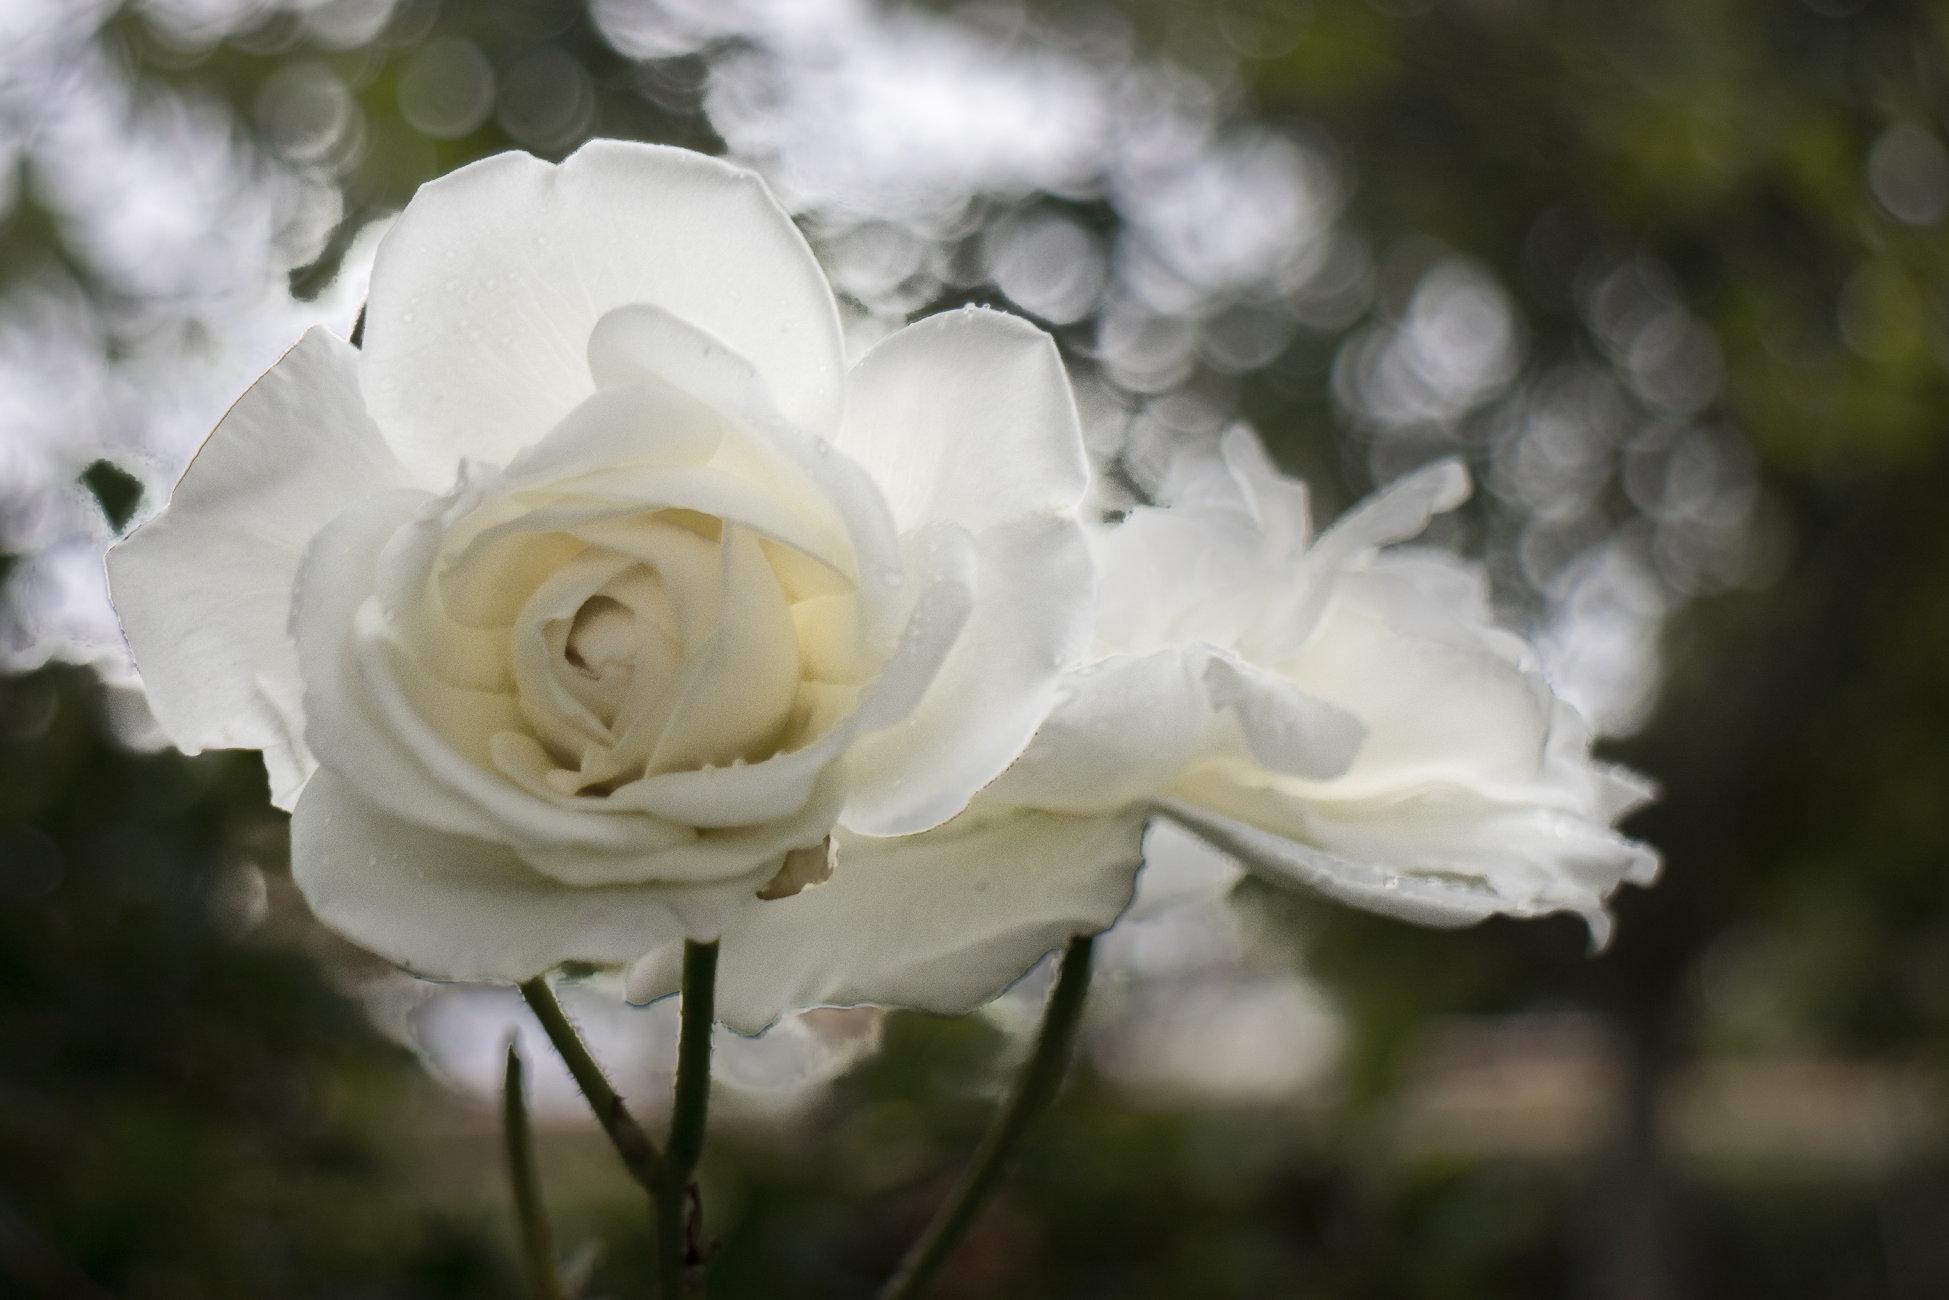 White rose in the rain